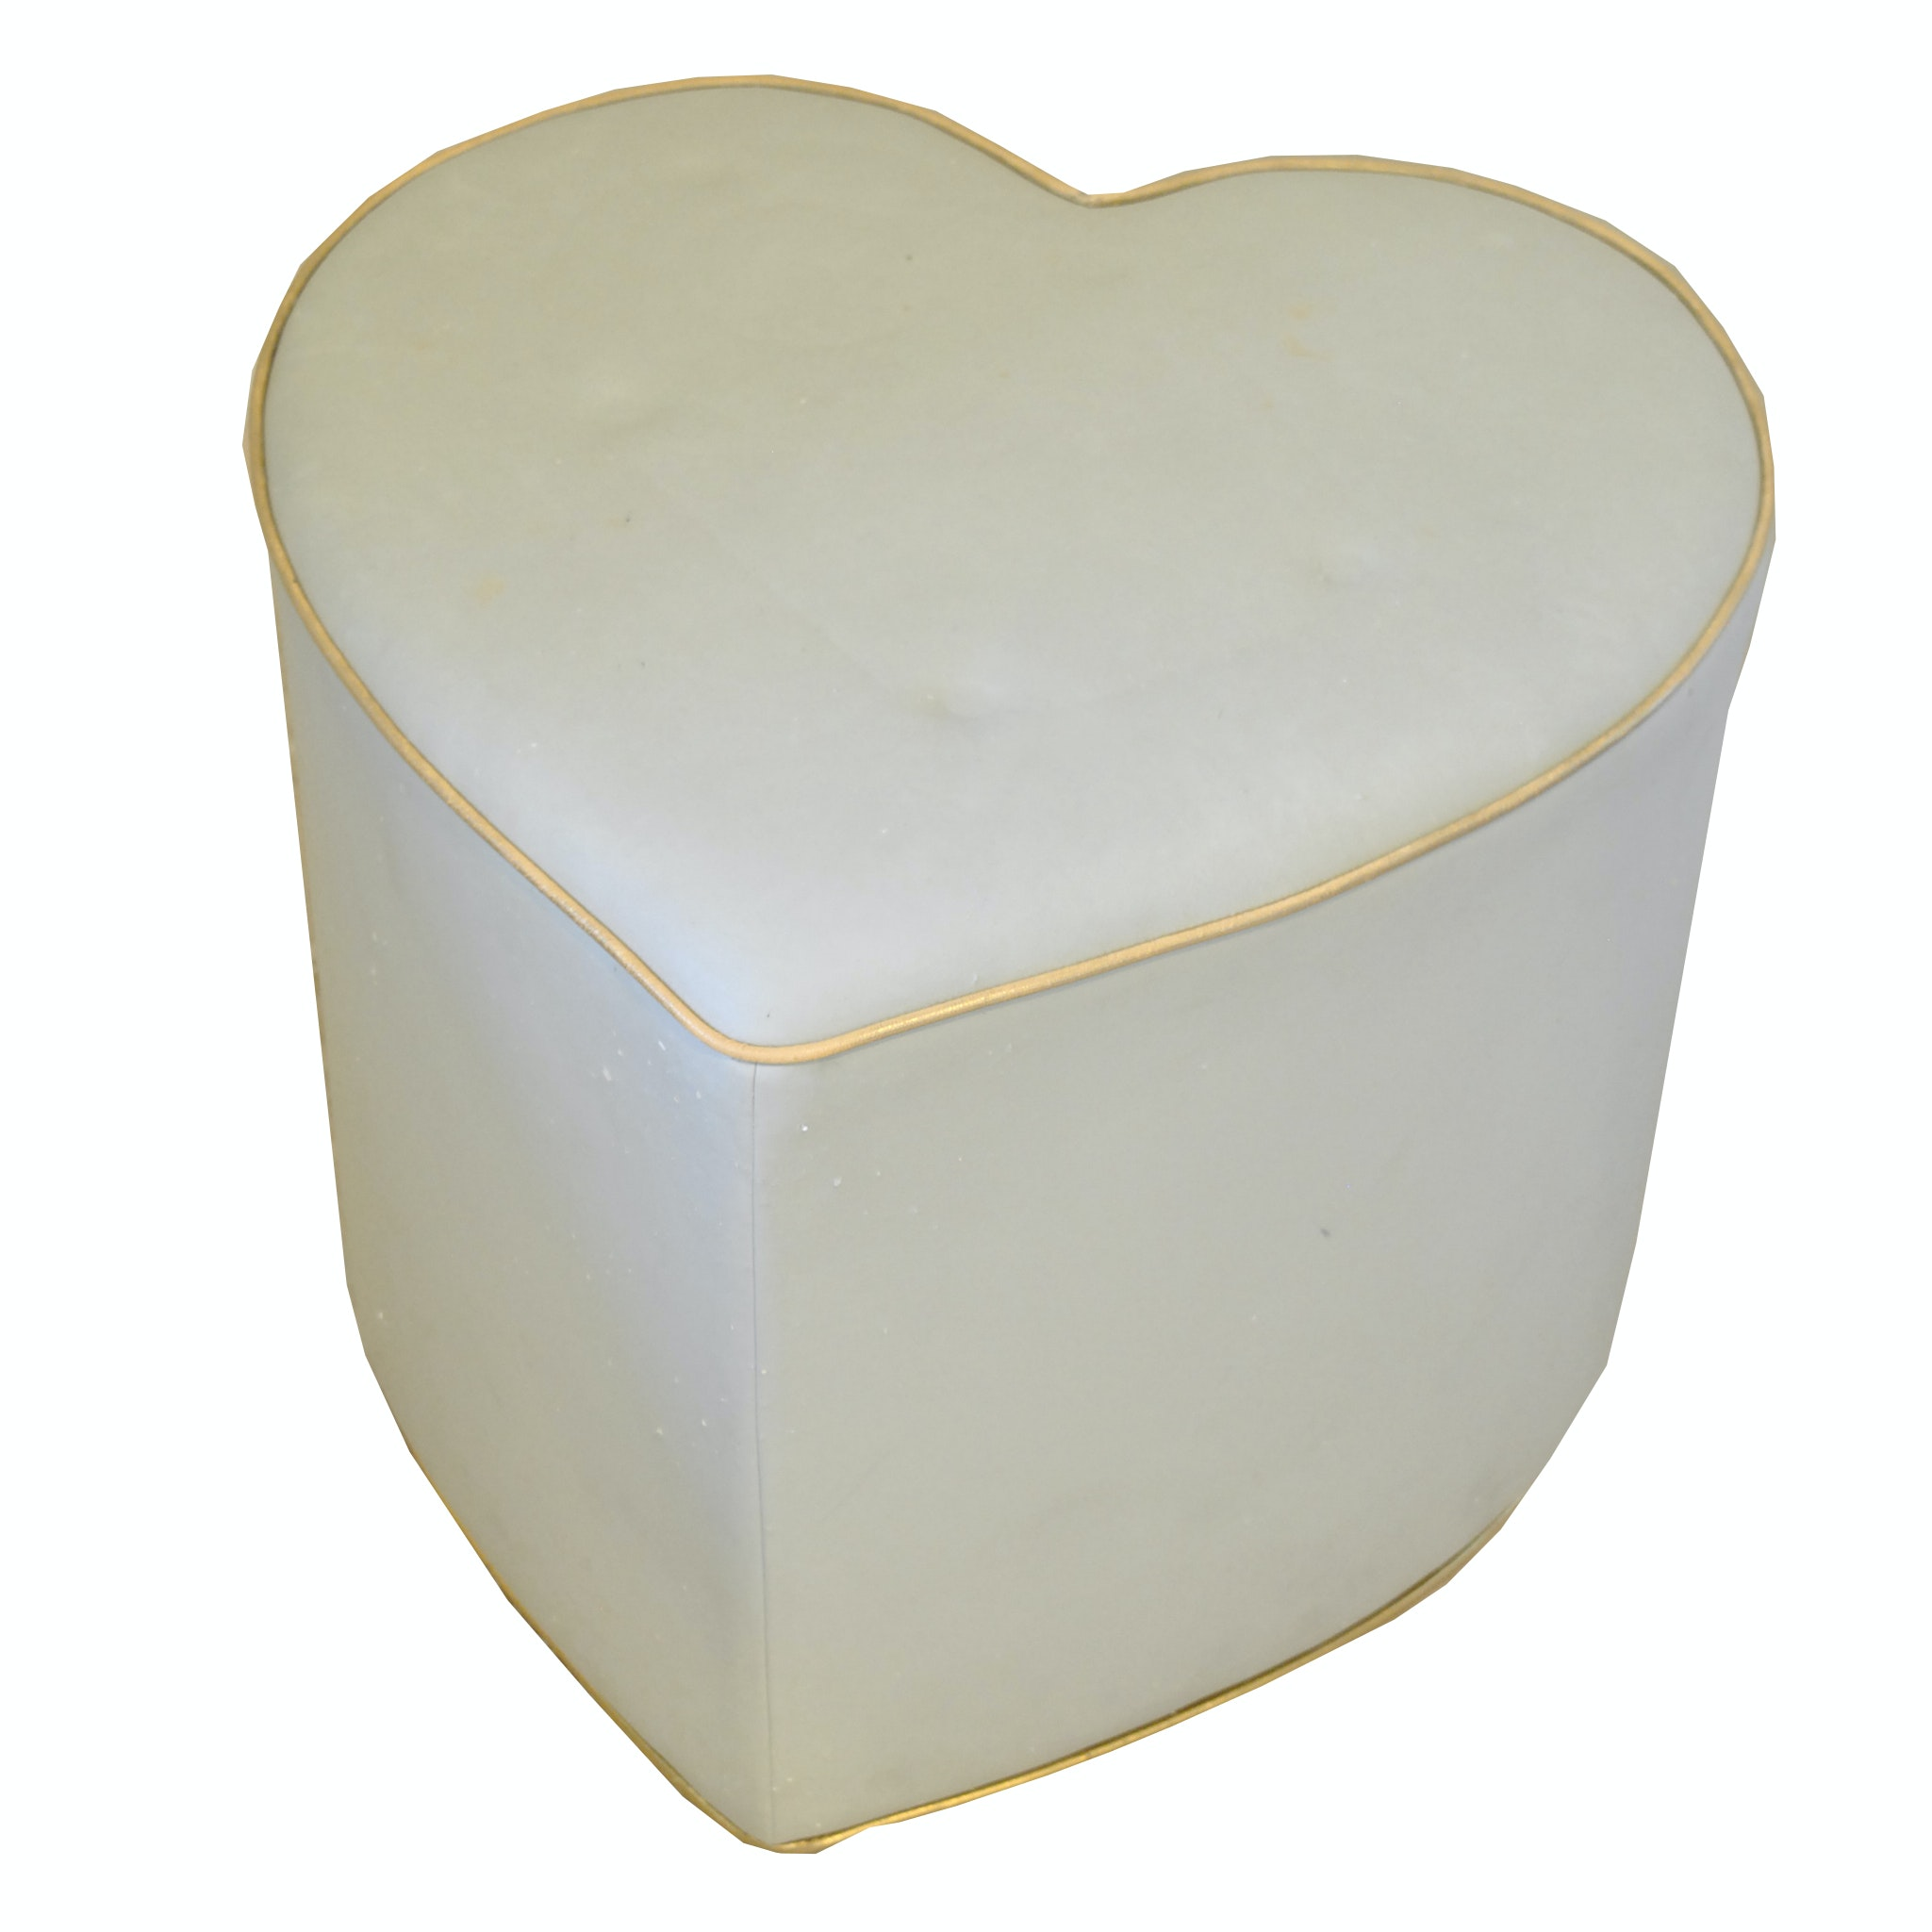 Heart Shaped Ottoman